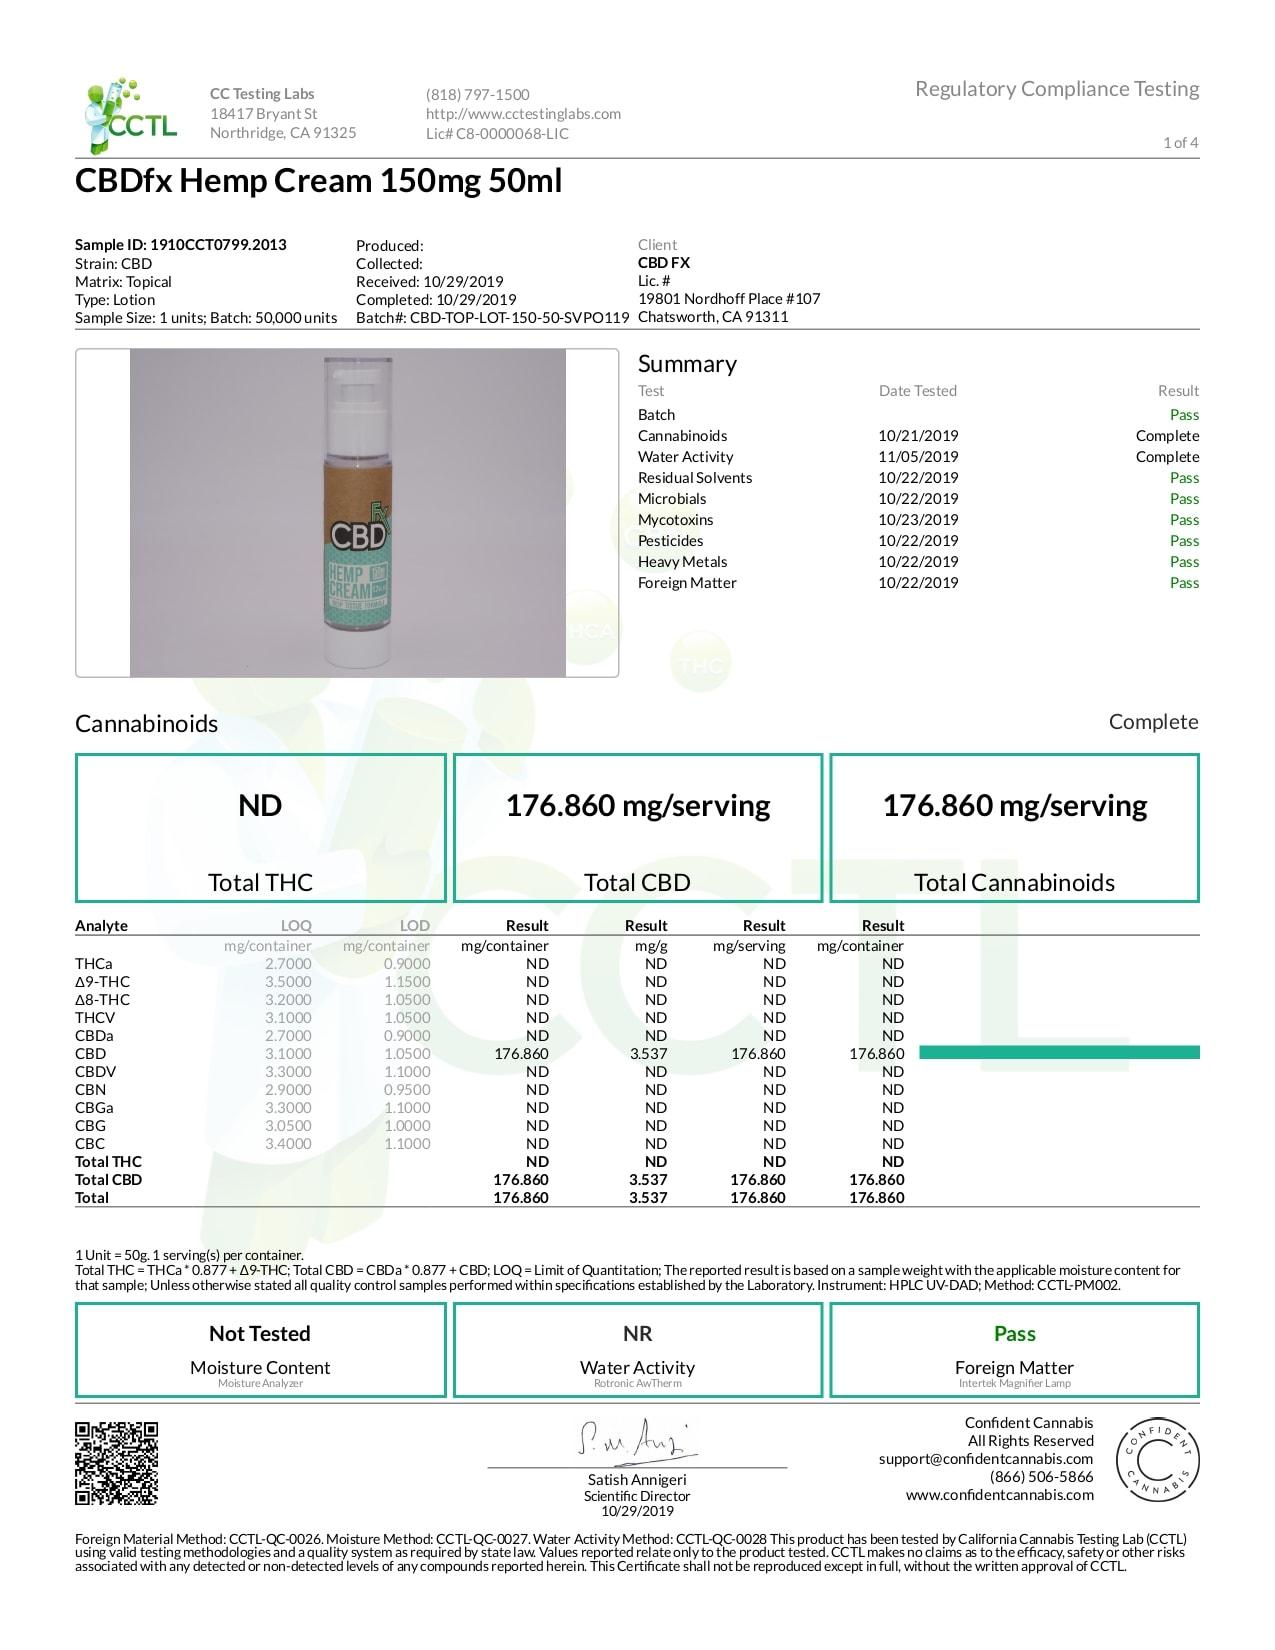 CBDfx CBD Cream 150mg Lab Report Broad Spectrum